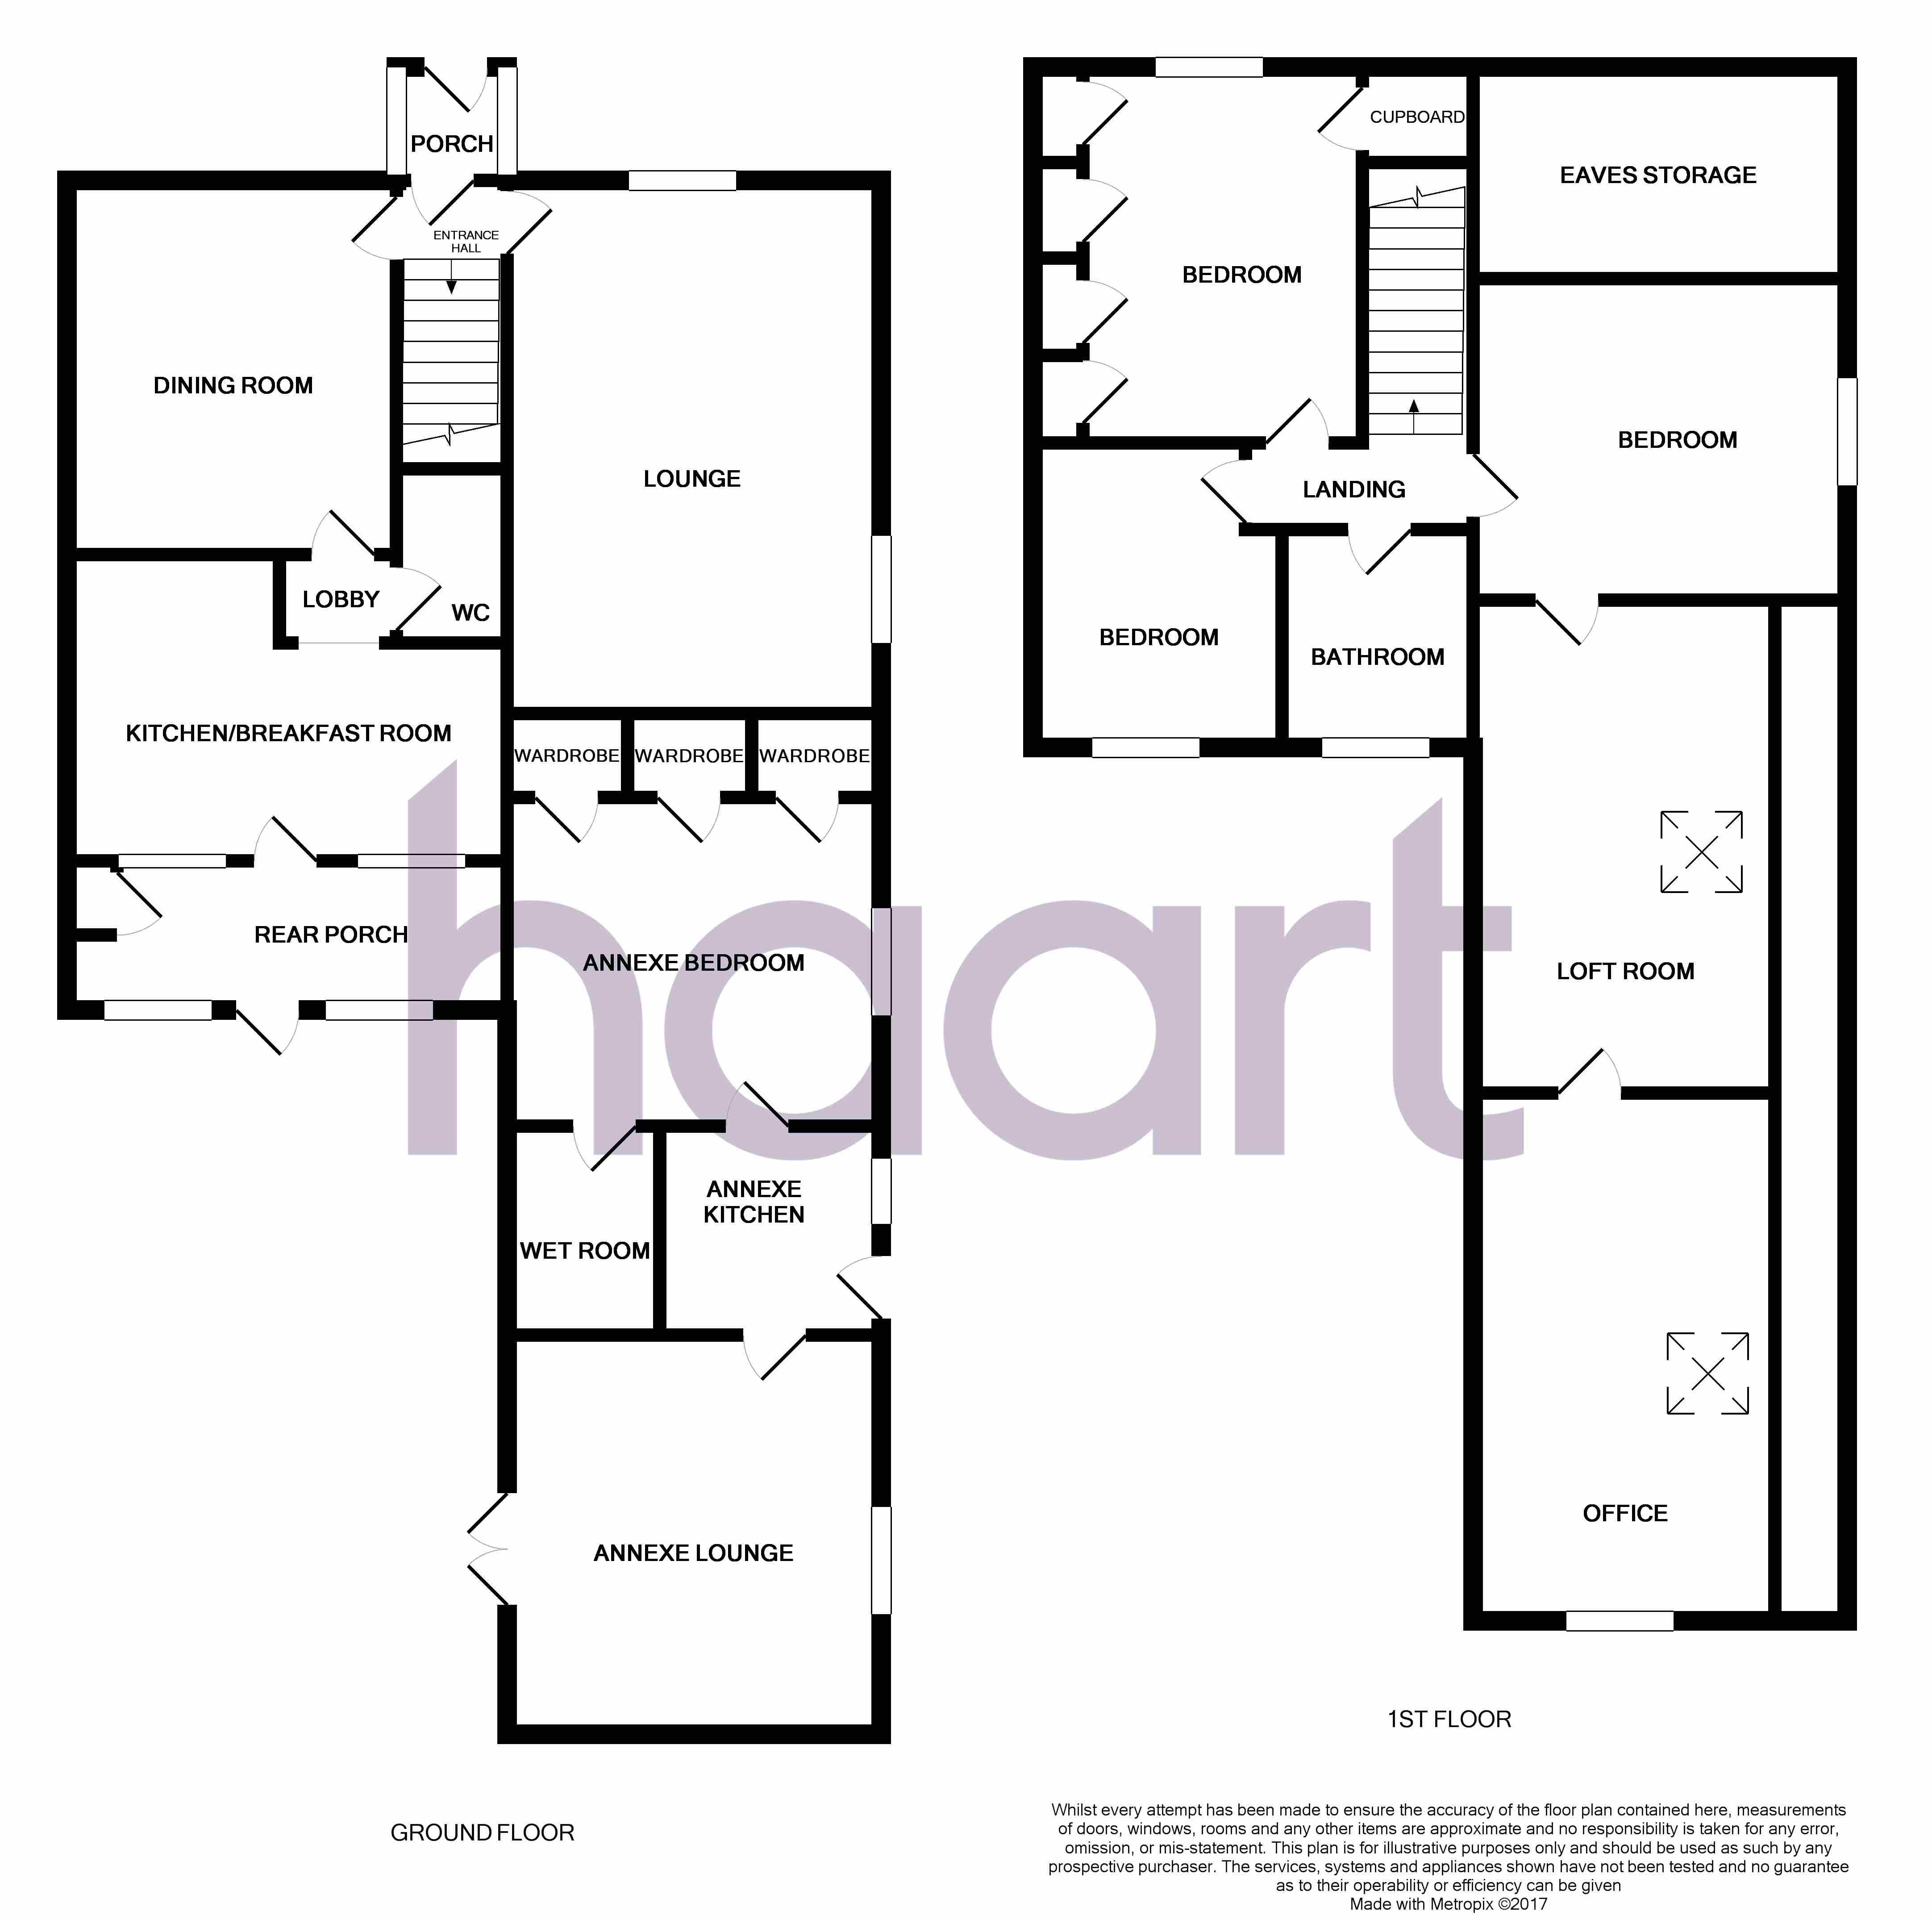 5 Bedroom Semi Detached House Floor Plans House Interior